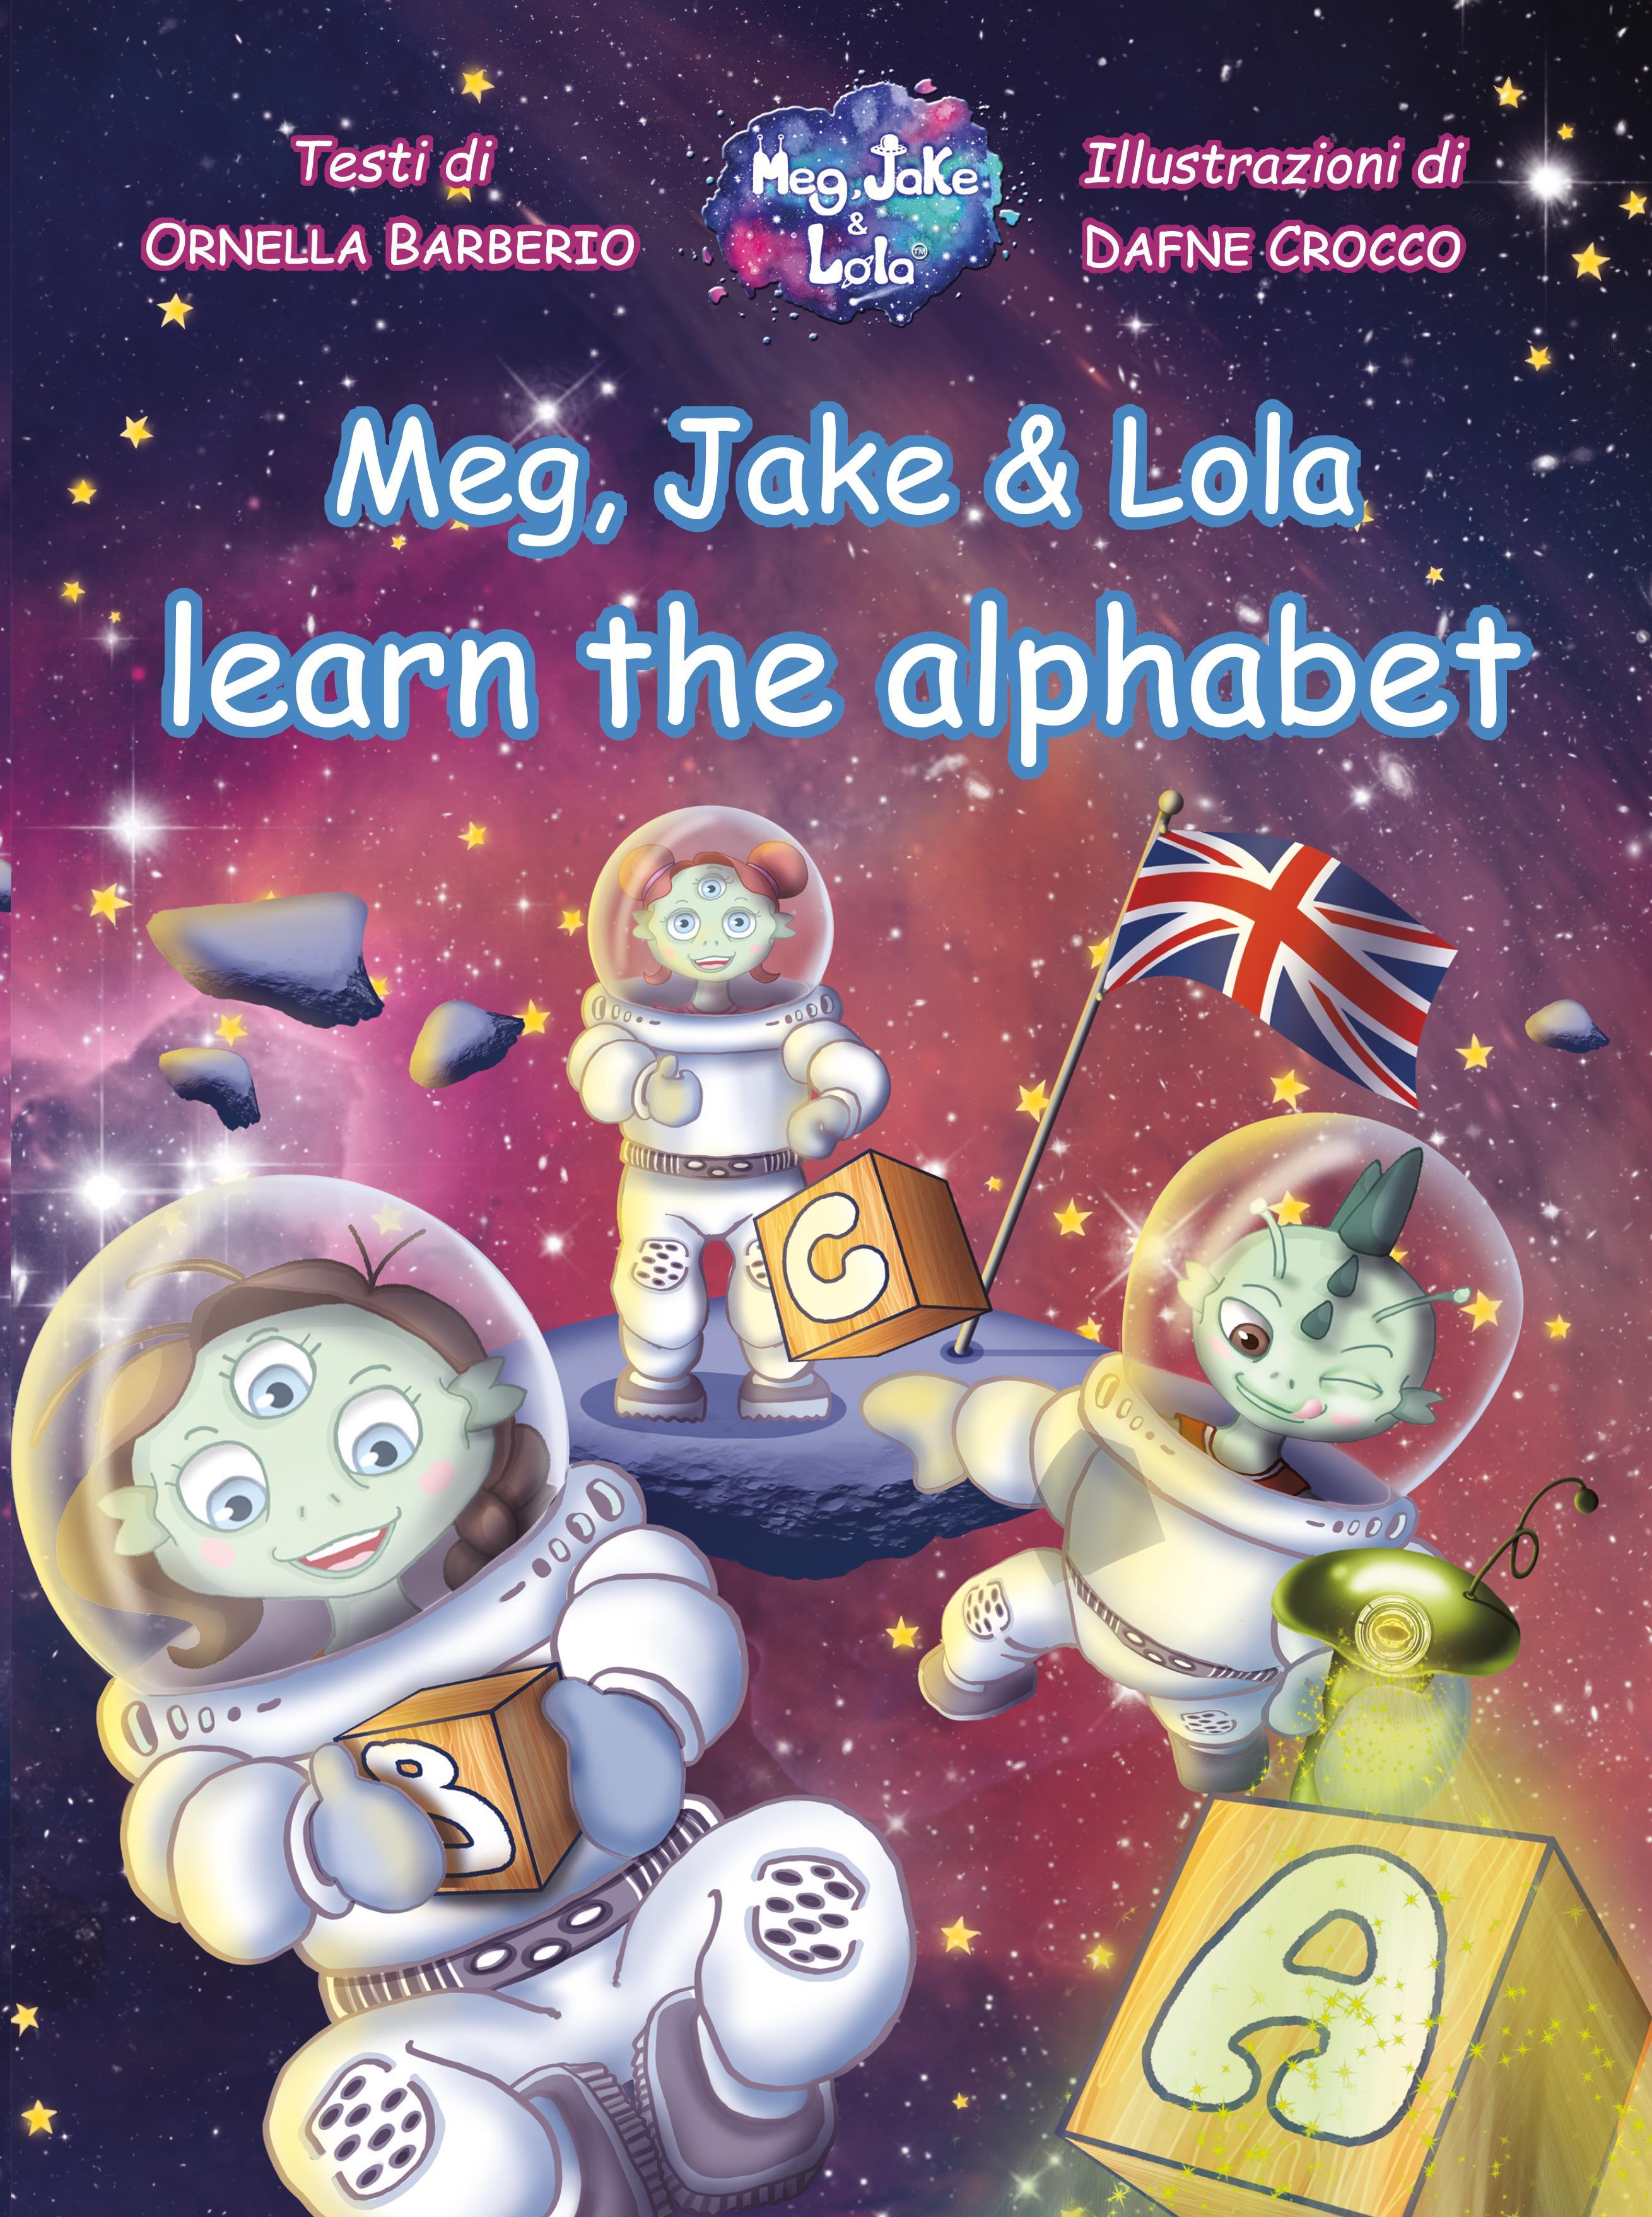 Meg, Jake & Lola learn the alphabet